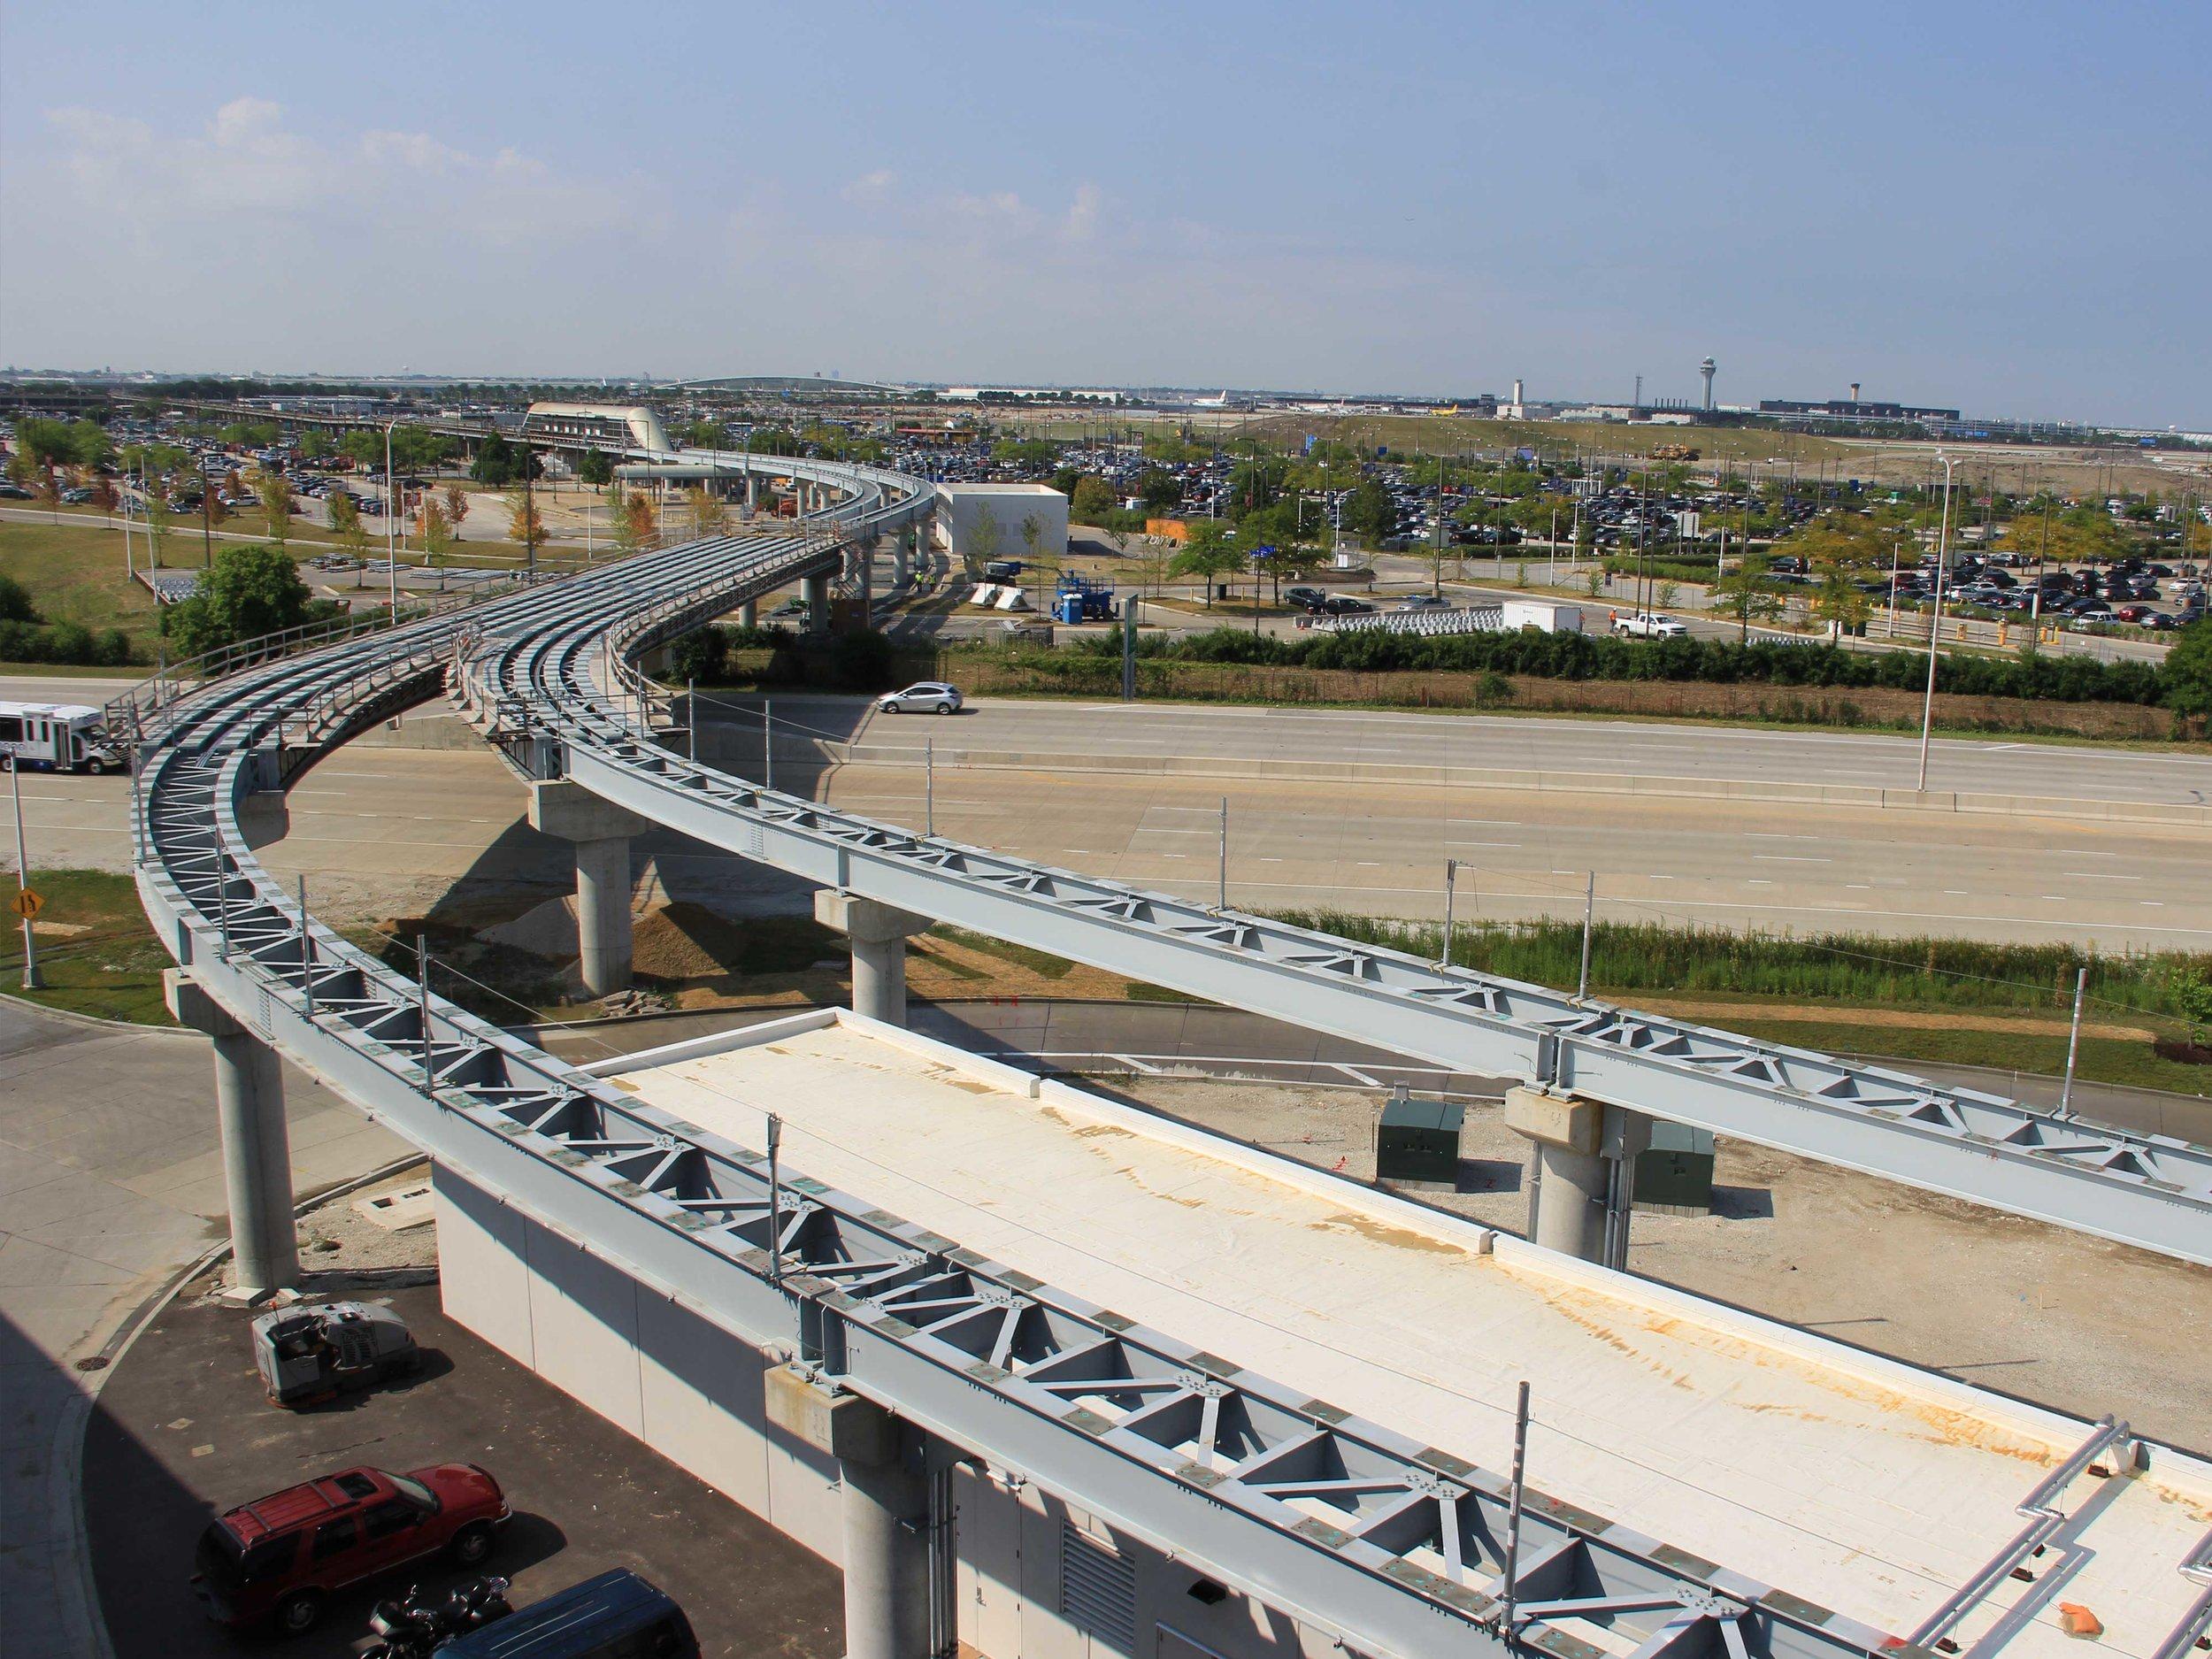 aldridge-electric-transportation-infrastructure-airport-transit-construction-projects.jpg